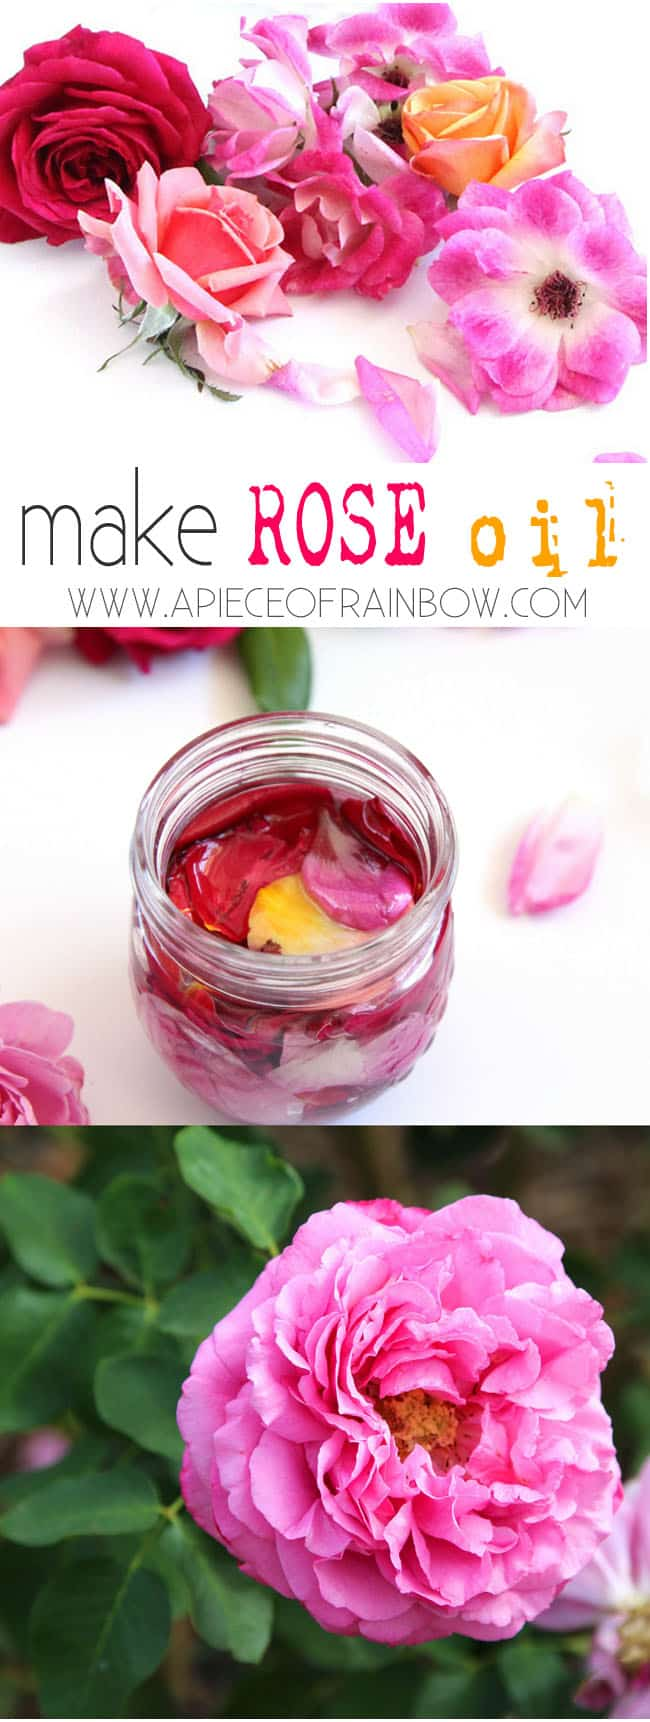 make_rose_oil_apieceofrainbowblog